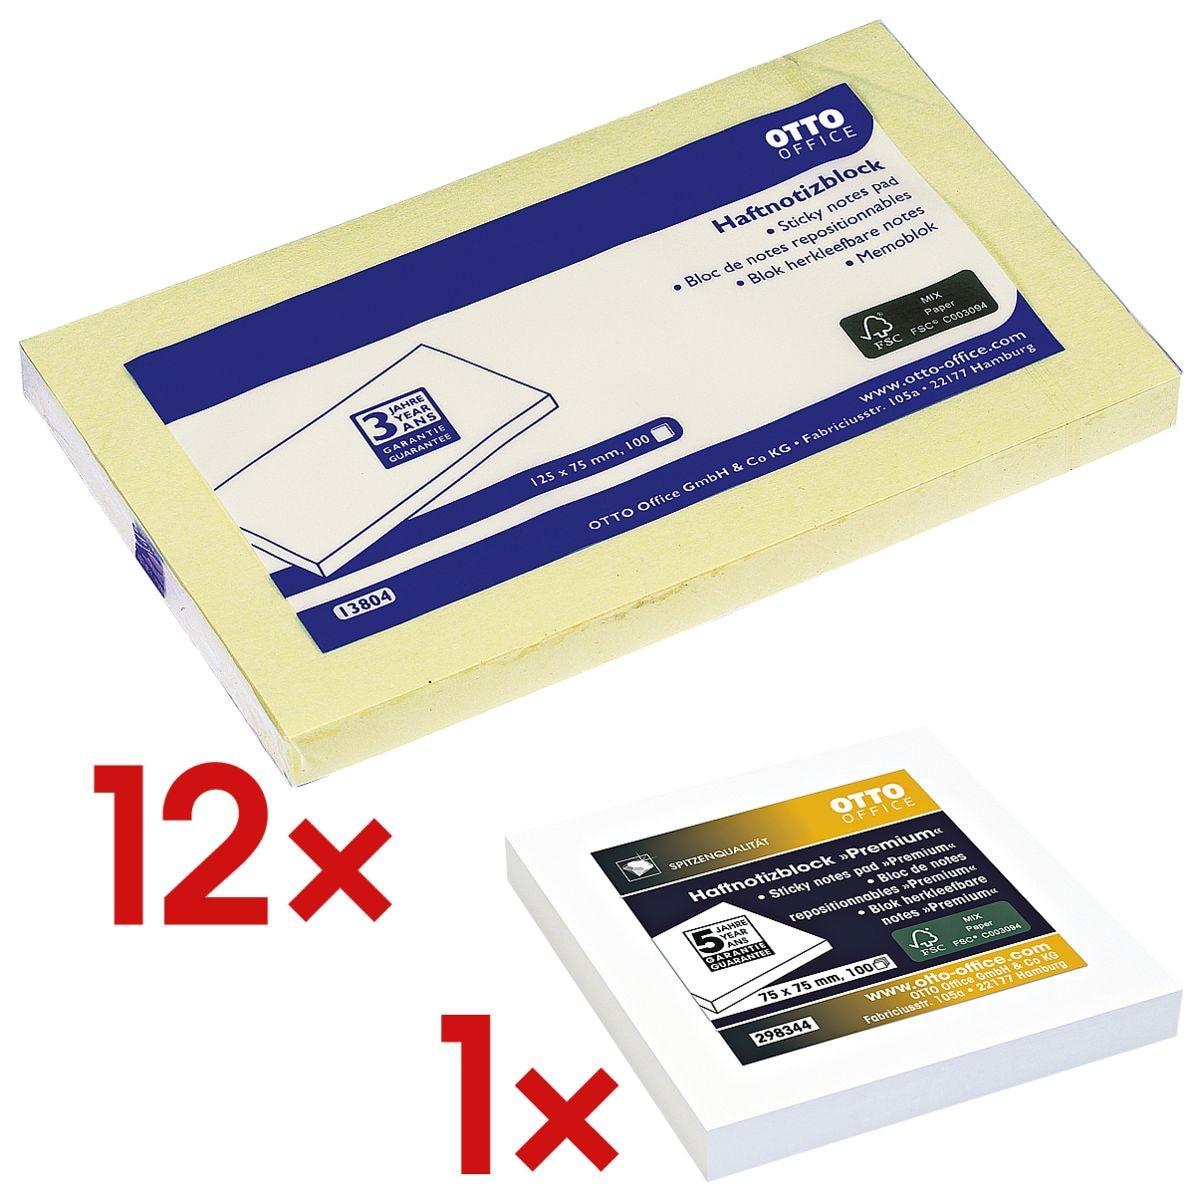 12x OTTO Office 12,5 x 7,5 cm, 1200 Blatt gesamt, gelb inkl. Haftnotizblock 75 x 75 mm weiß